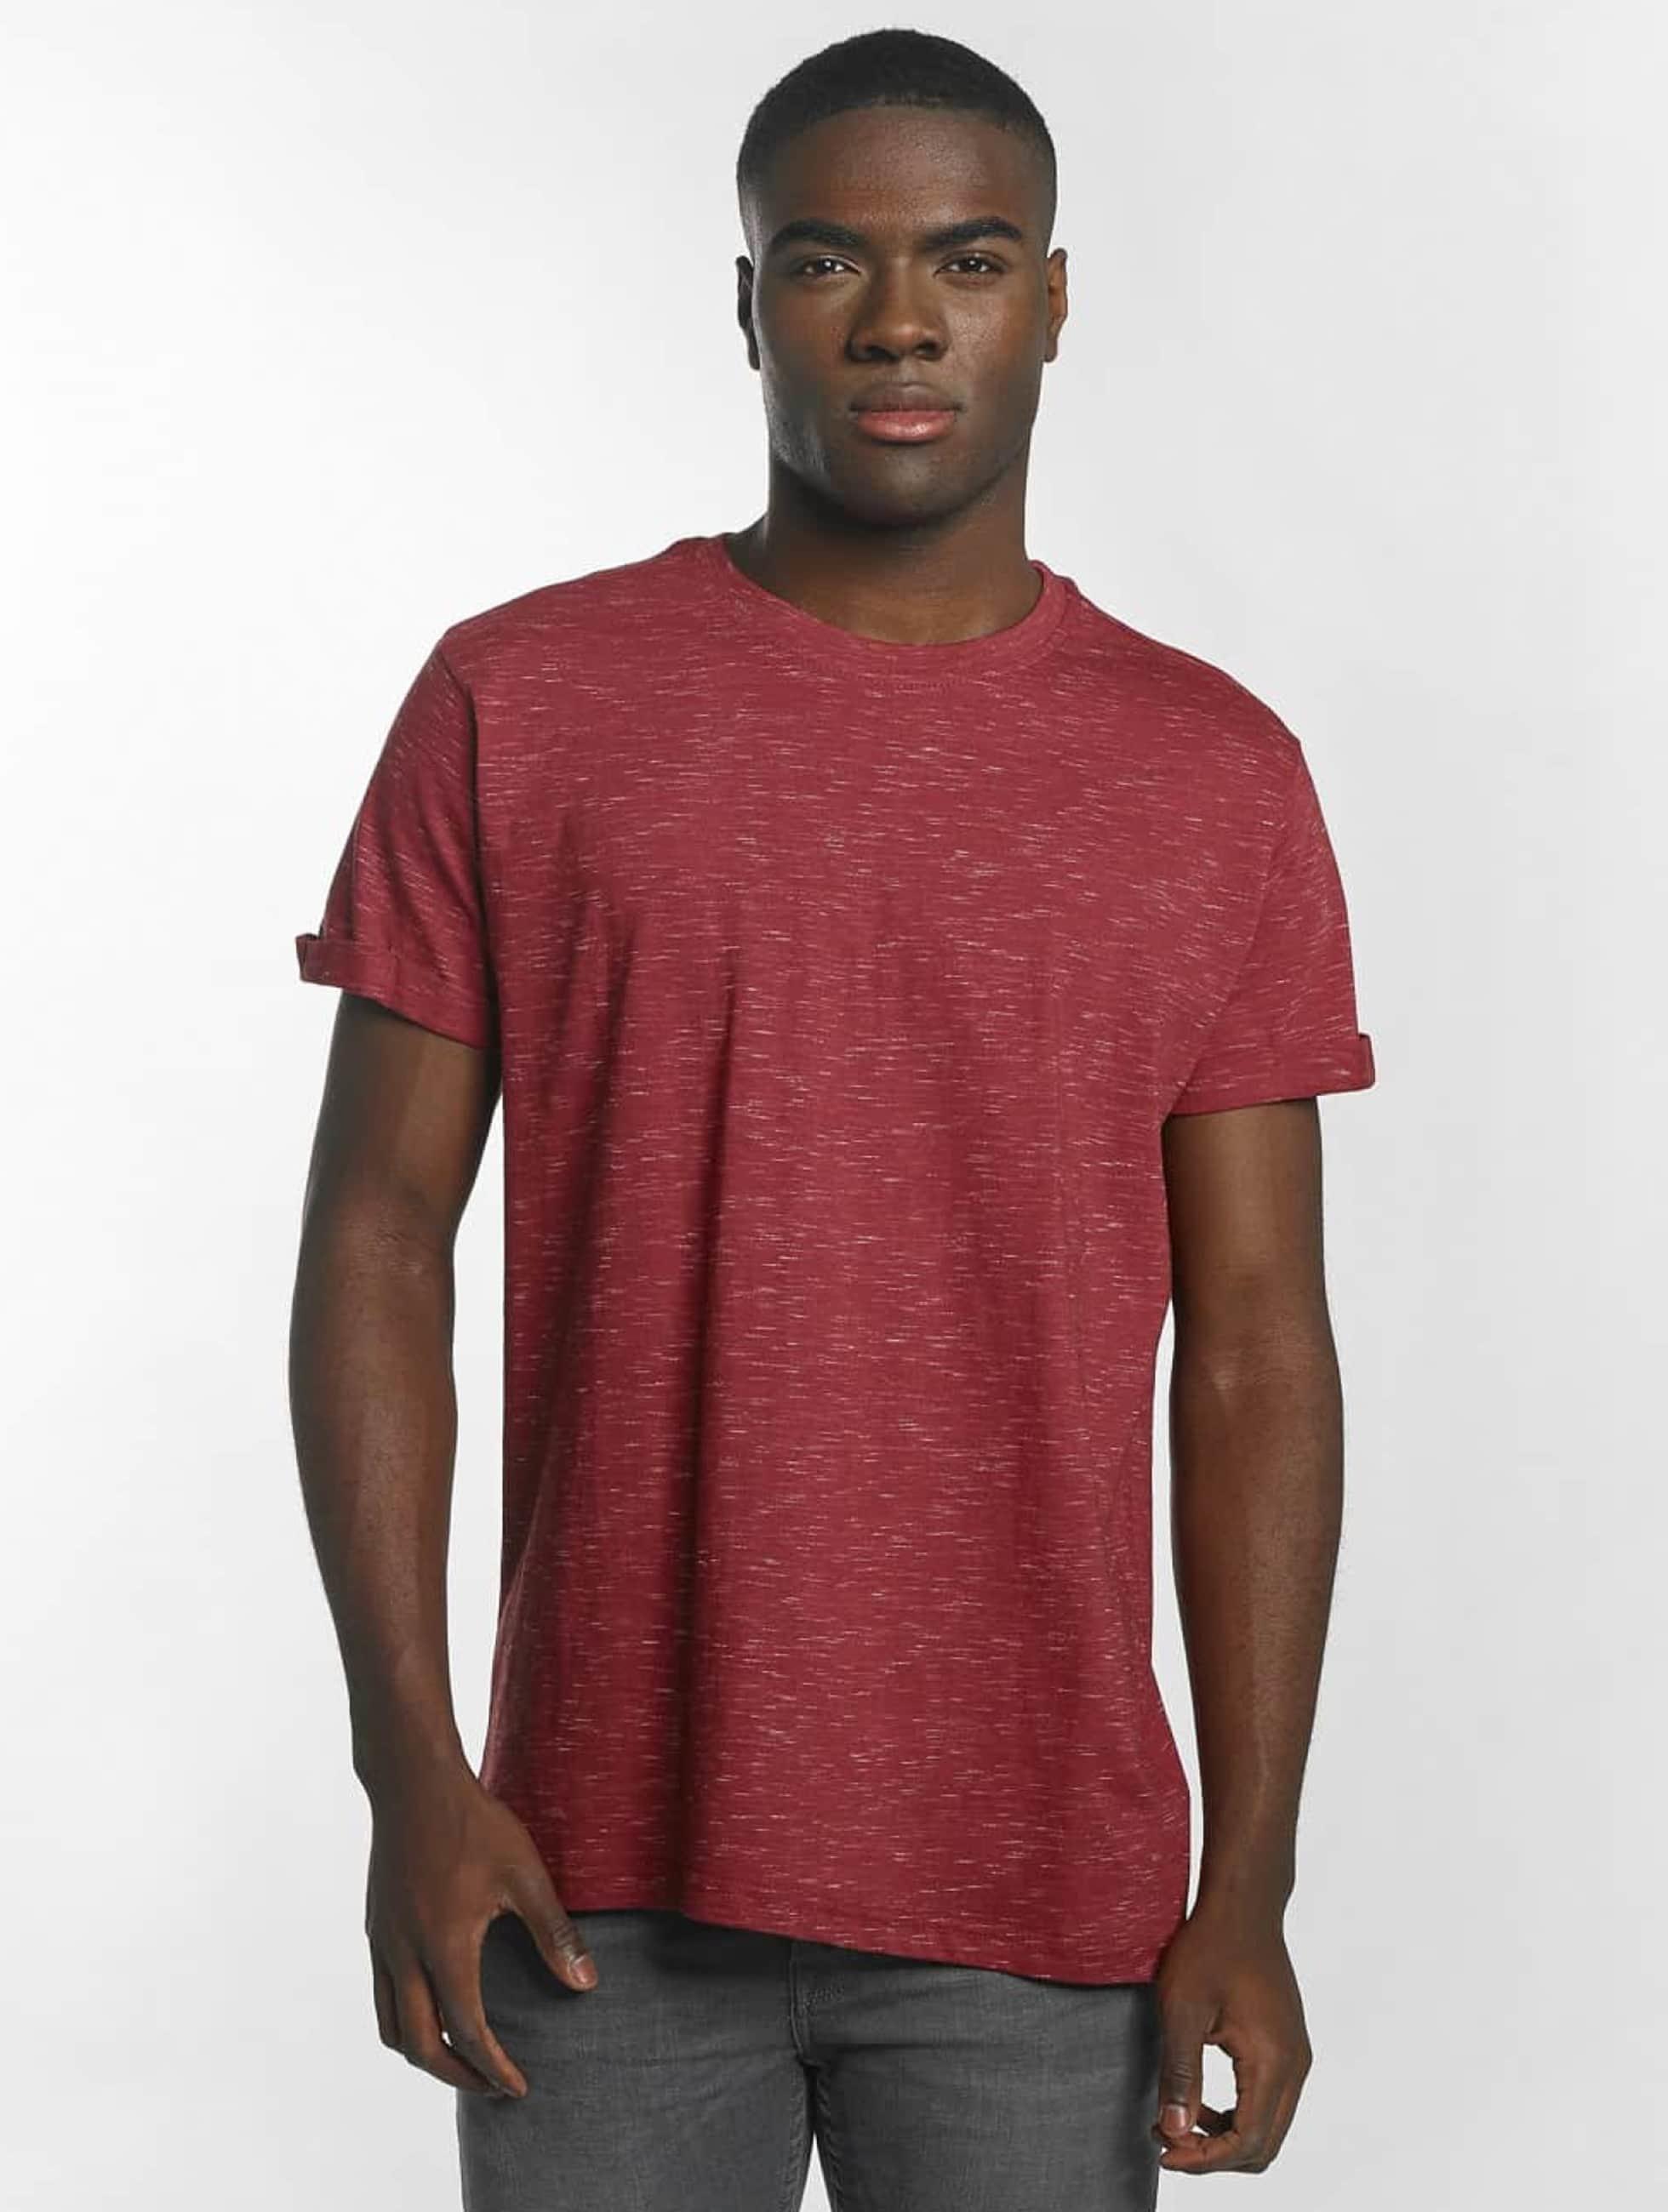 Urban Classics T-Shirt Space Dye Turnup rot